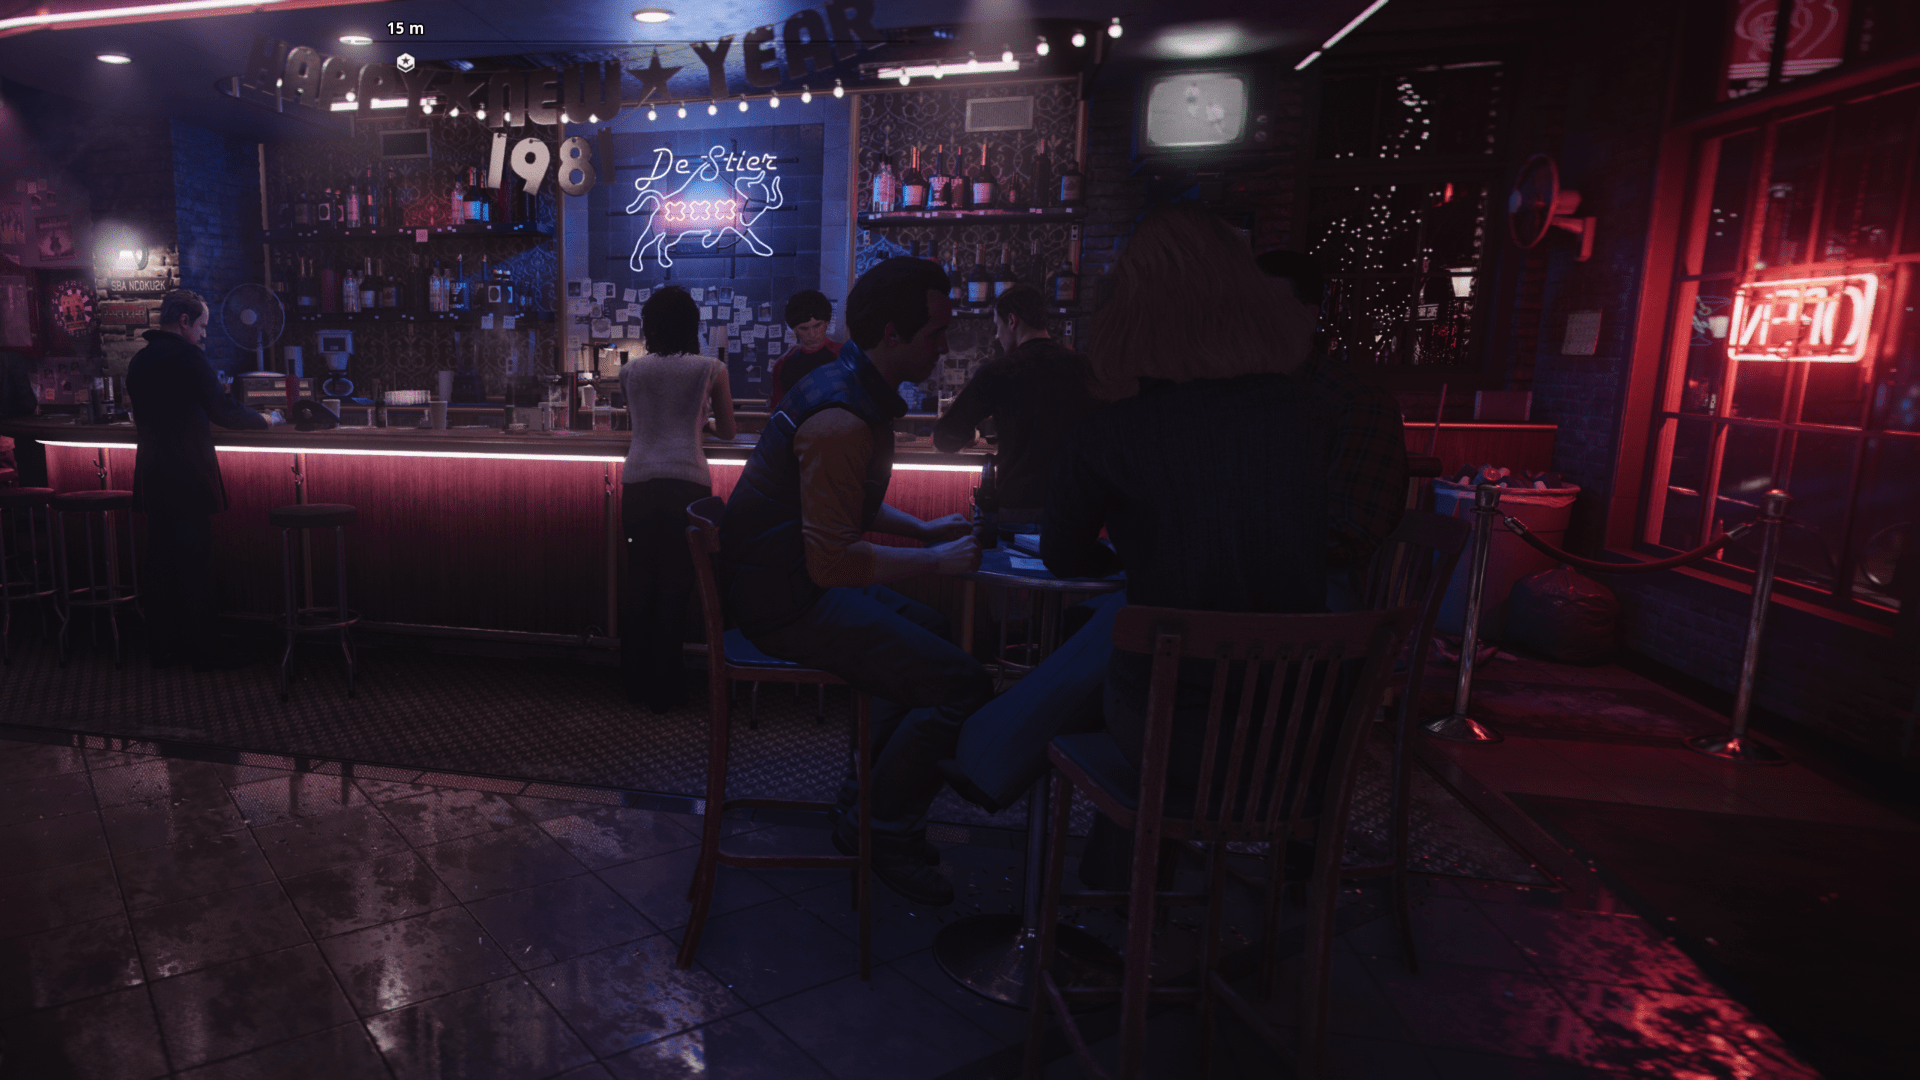 Barszene im dunkeln mit roter Ambientebeleuchtung Spiel Call of Duty